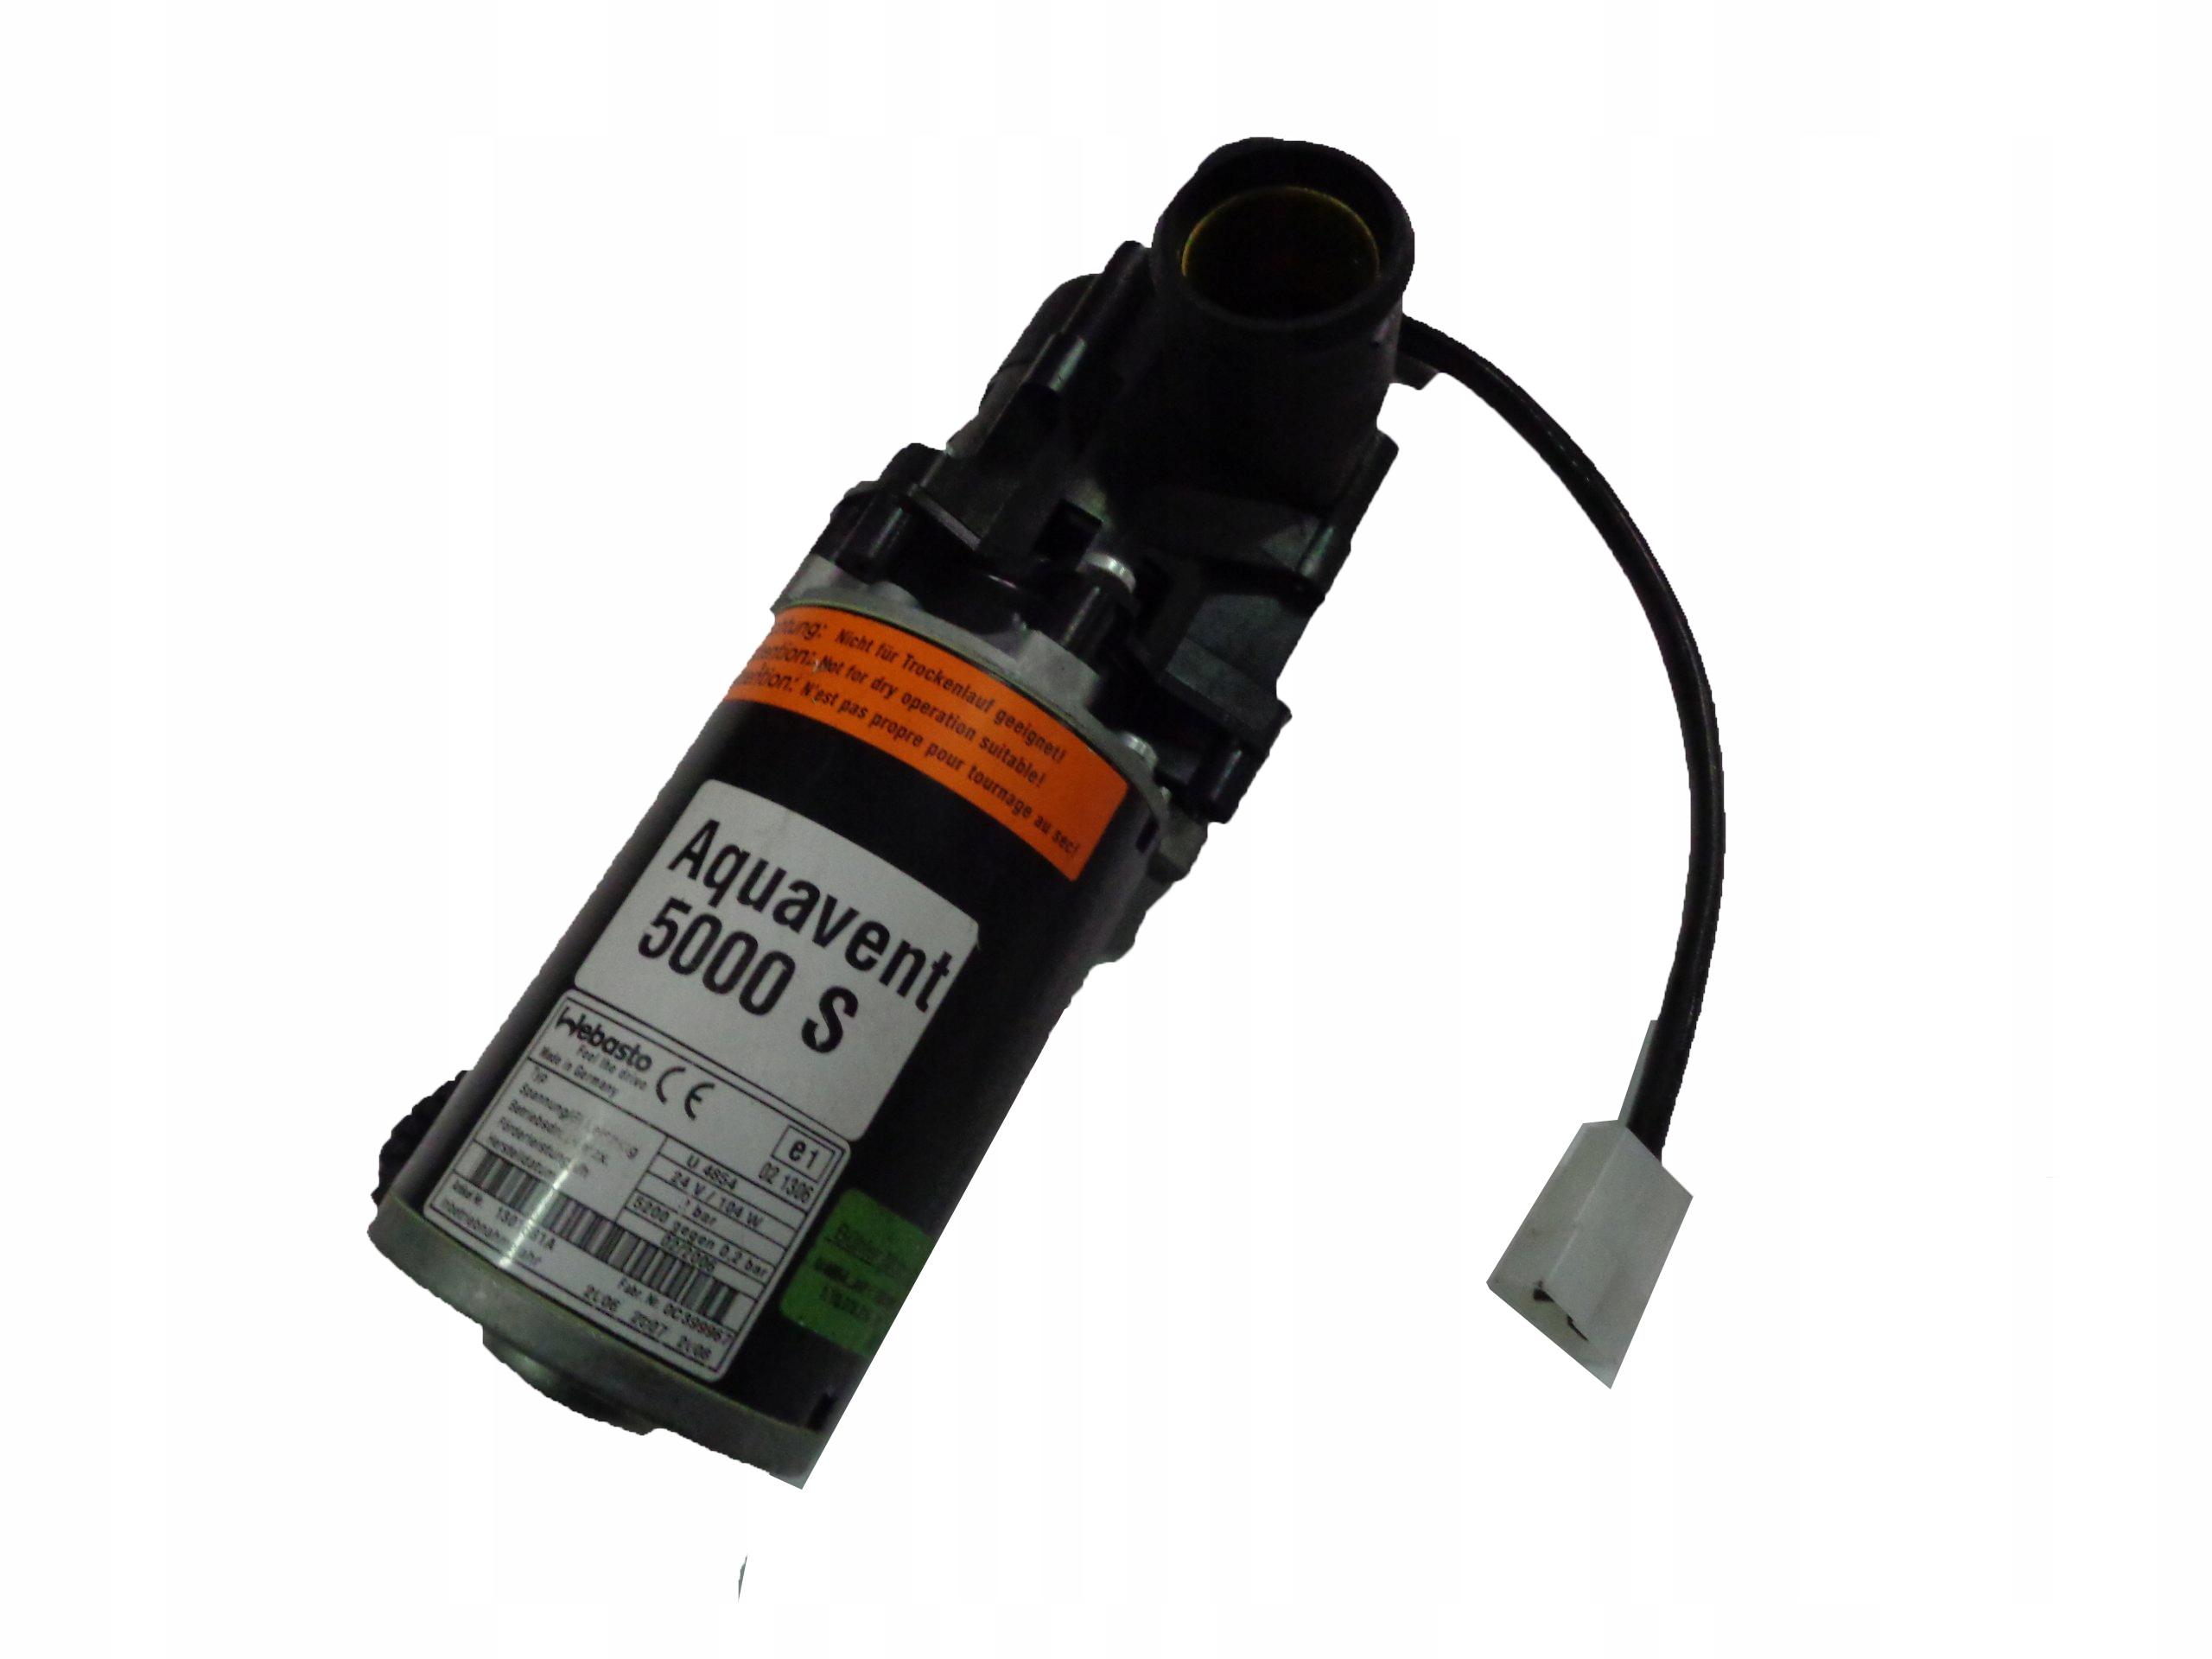 Pompa Wody Webasto AQUAVENT 5000s SPHEROS U4854